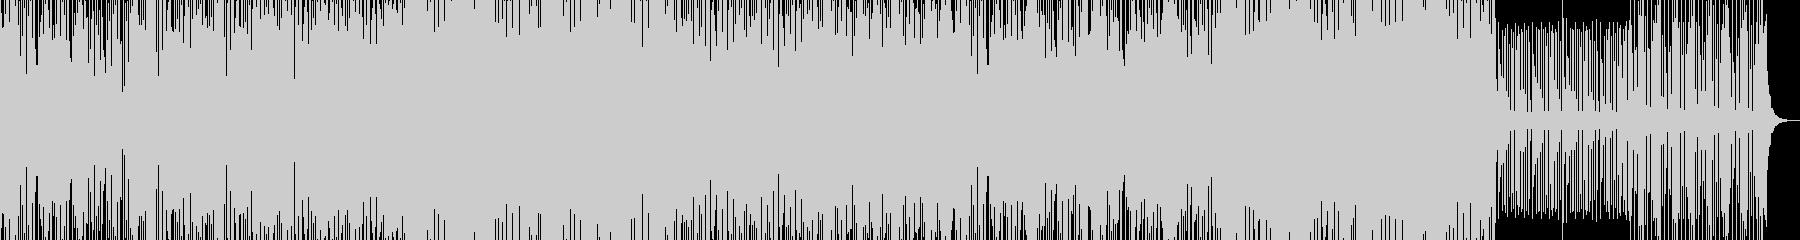 【CM】ダークな雰囲気・ドラムンベースの未再生の波形